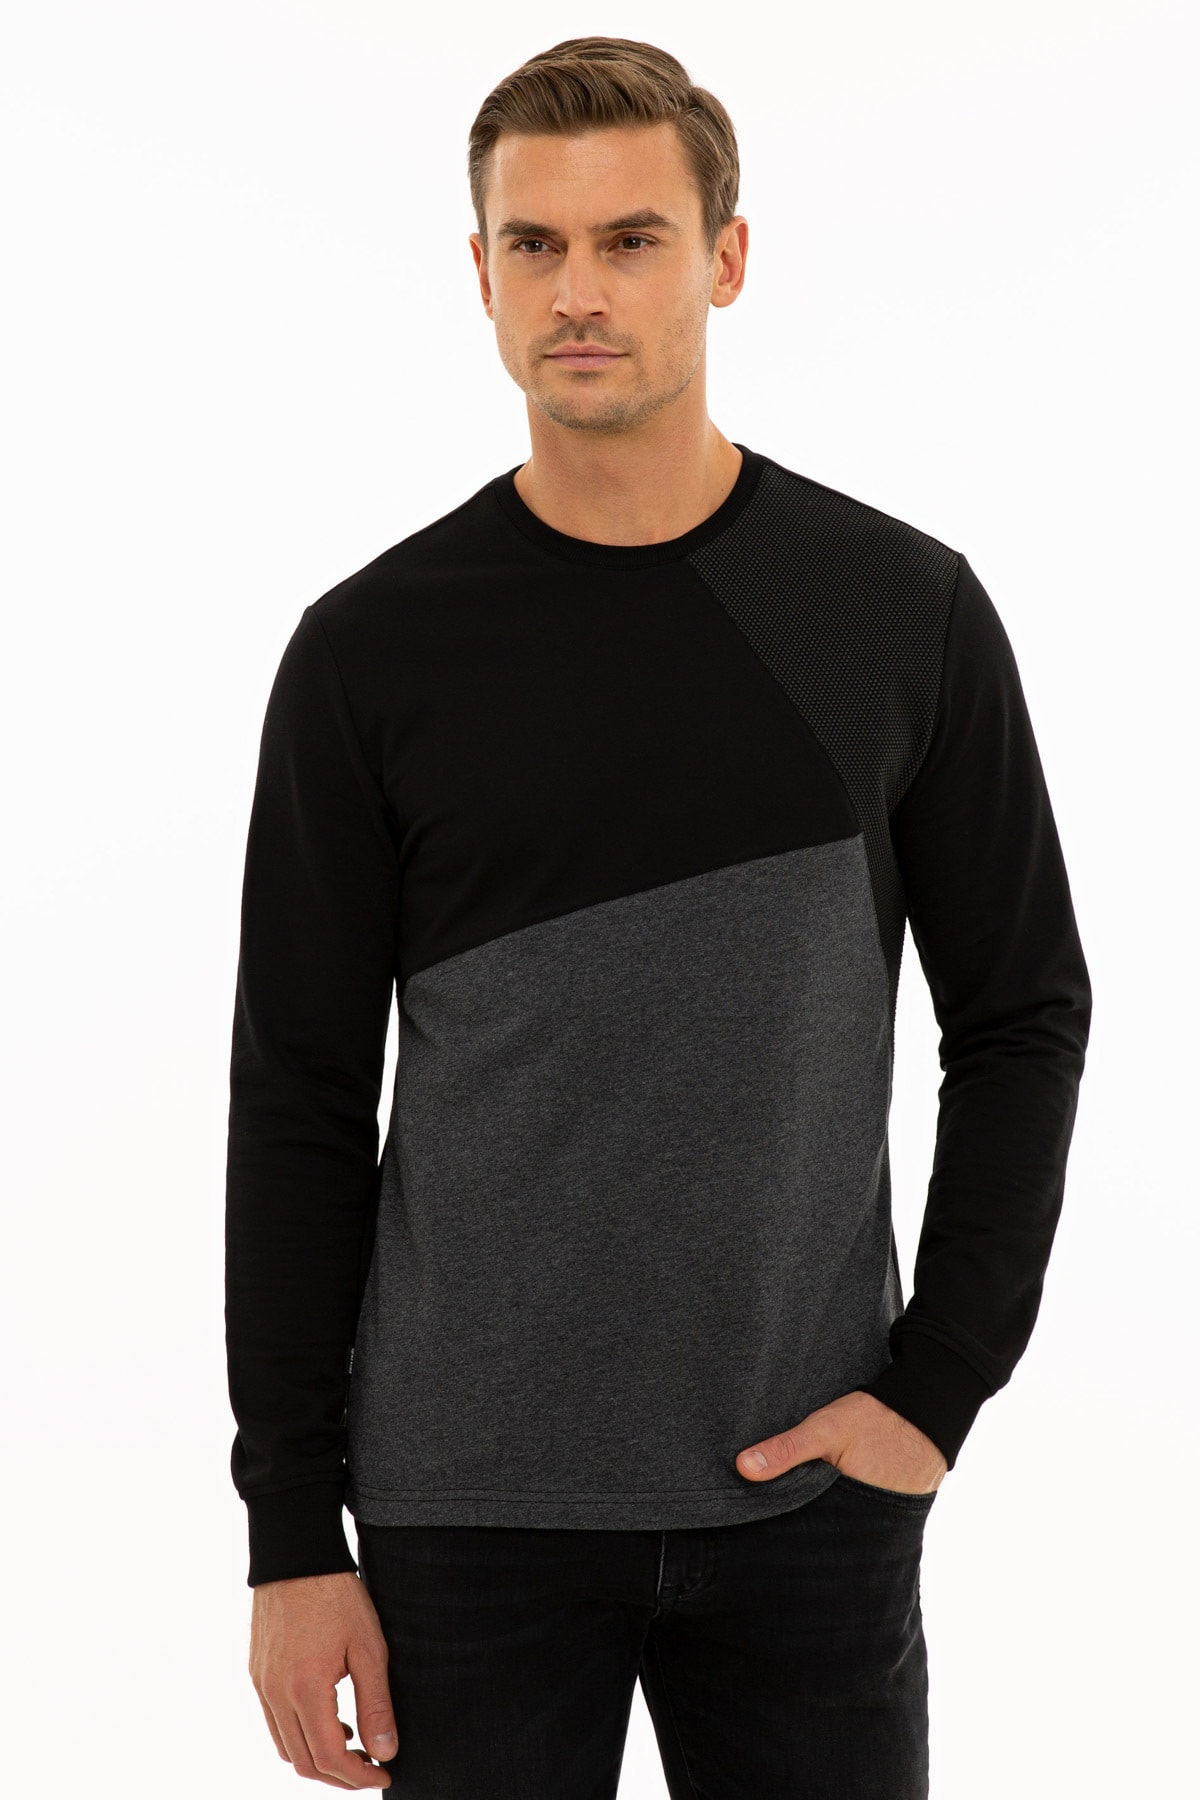 Pierre Cardin Erkek Siyah Reguar Fit Sweatshirt G021SZ082.000.1235975 1